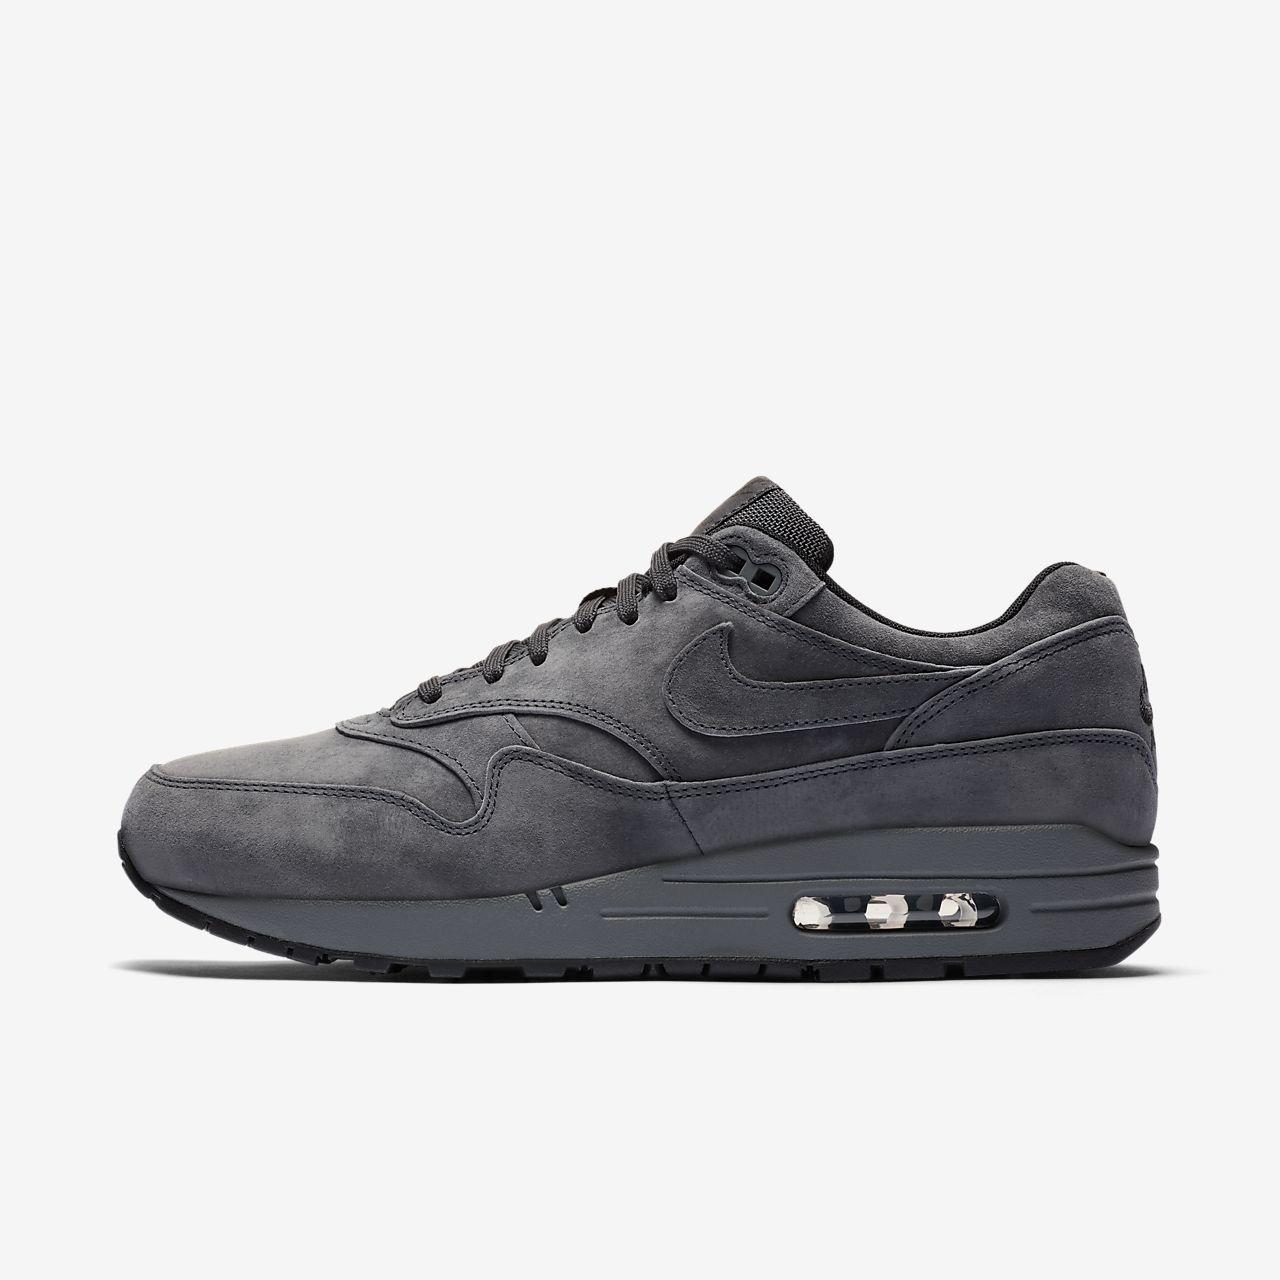 b78a22f9baf Nike Air Max 1 Premium Men s Shoe. Nike.com SI